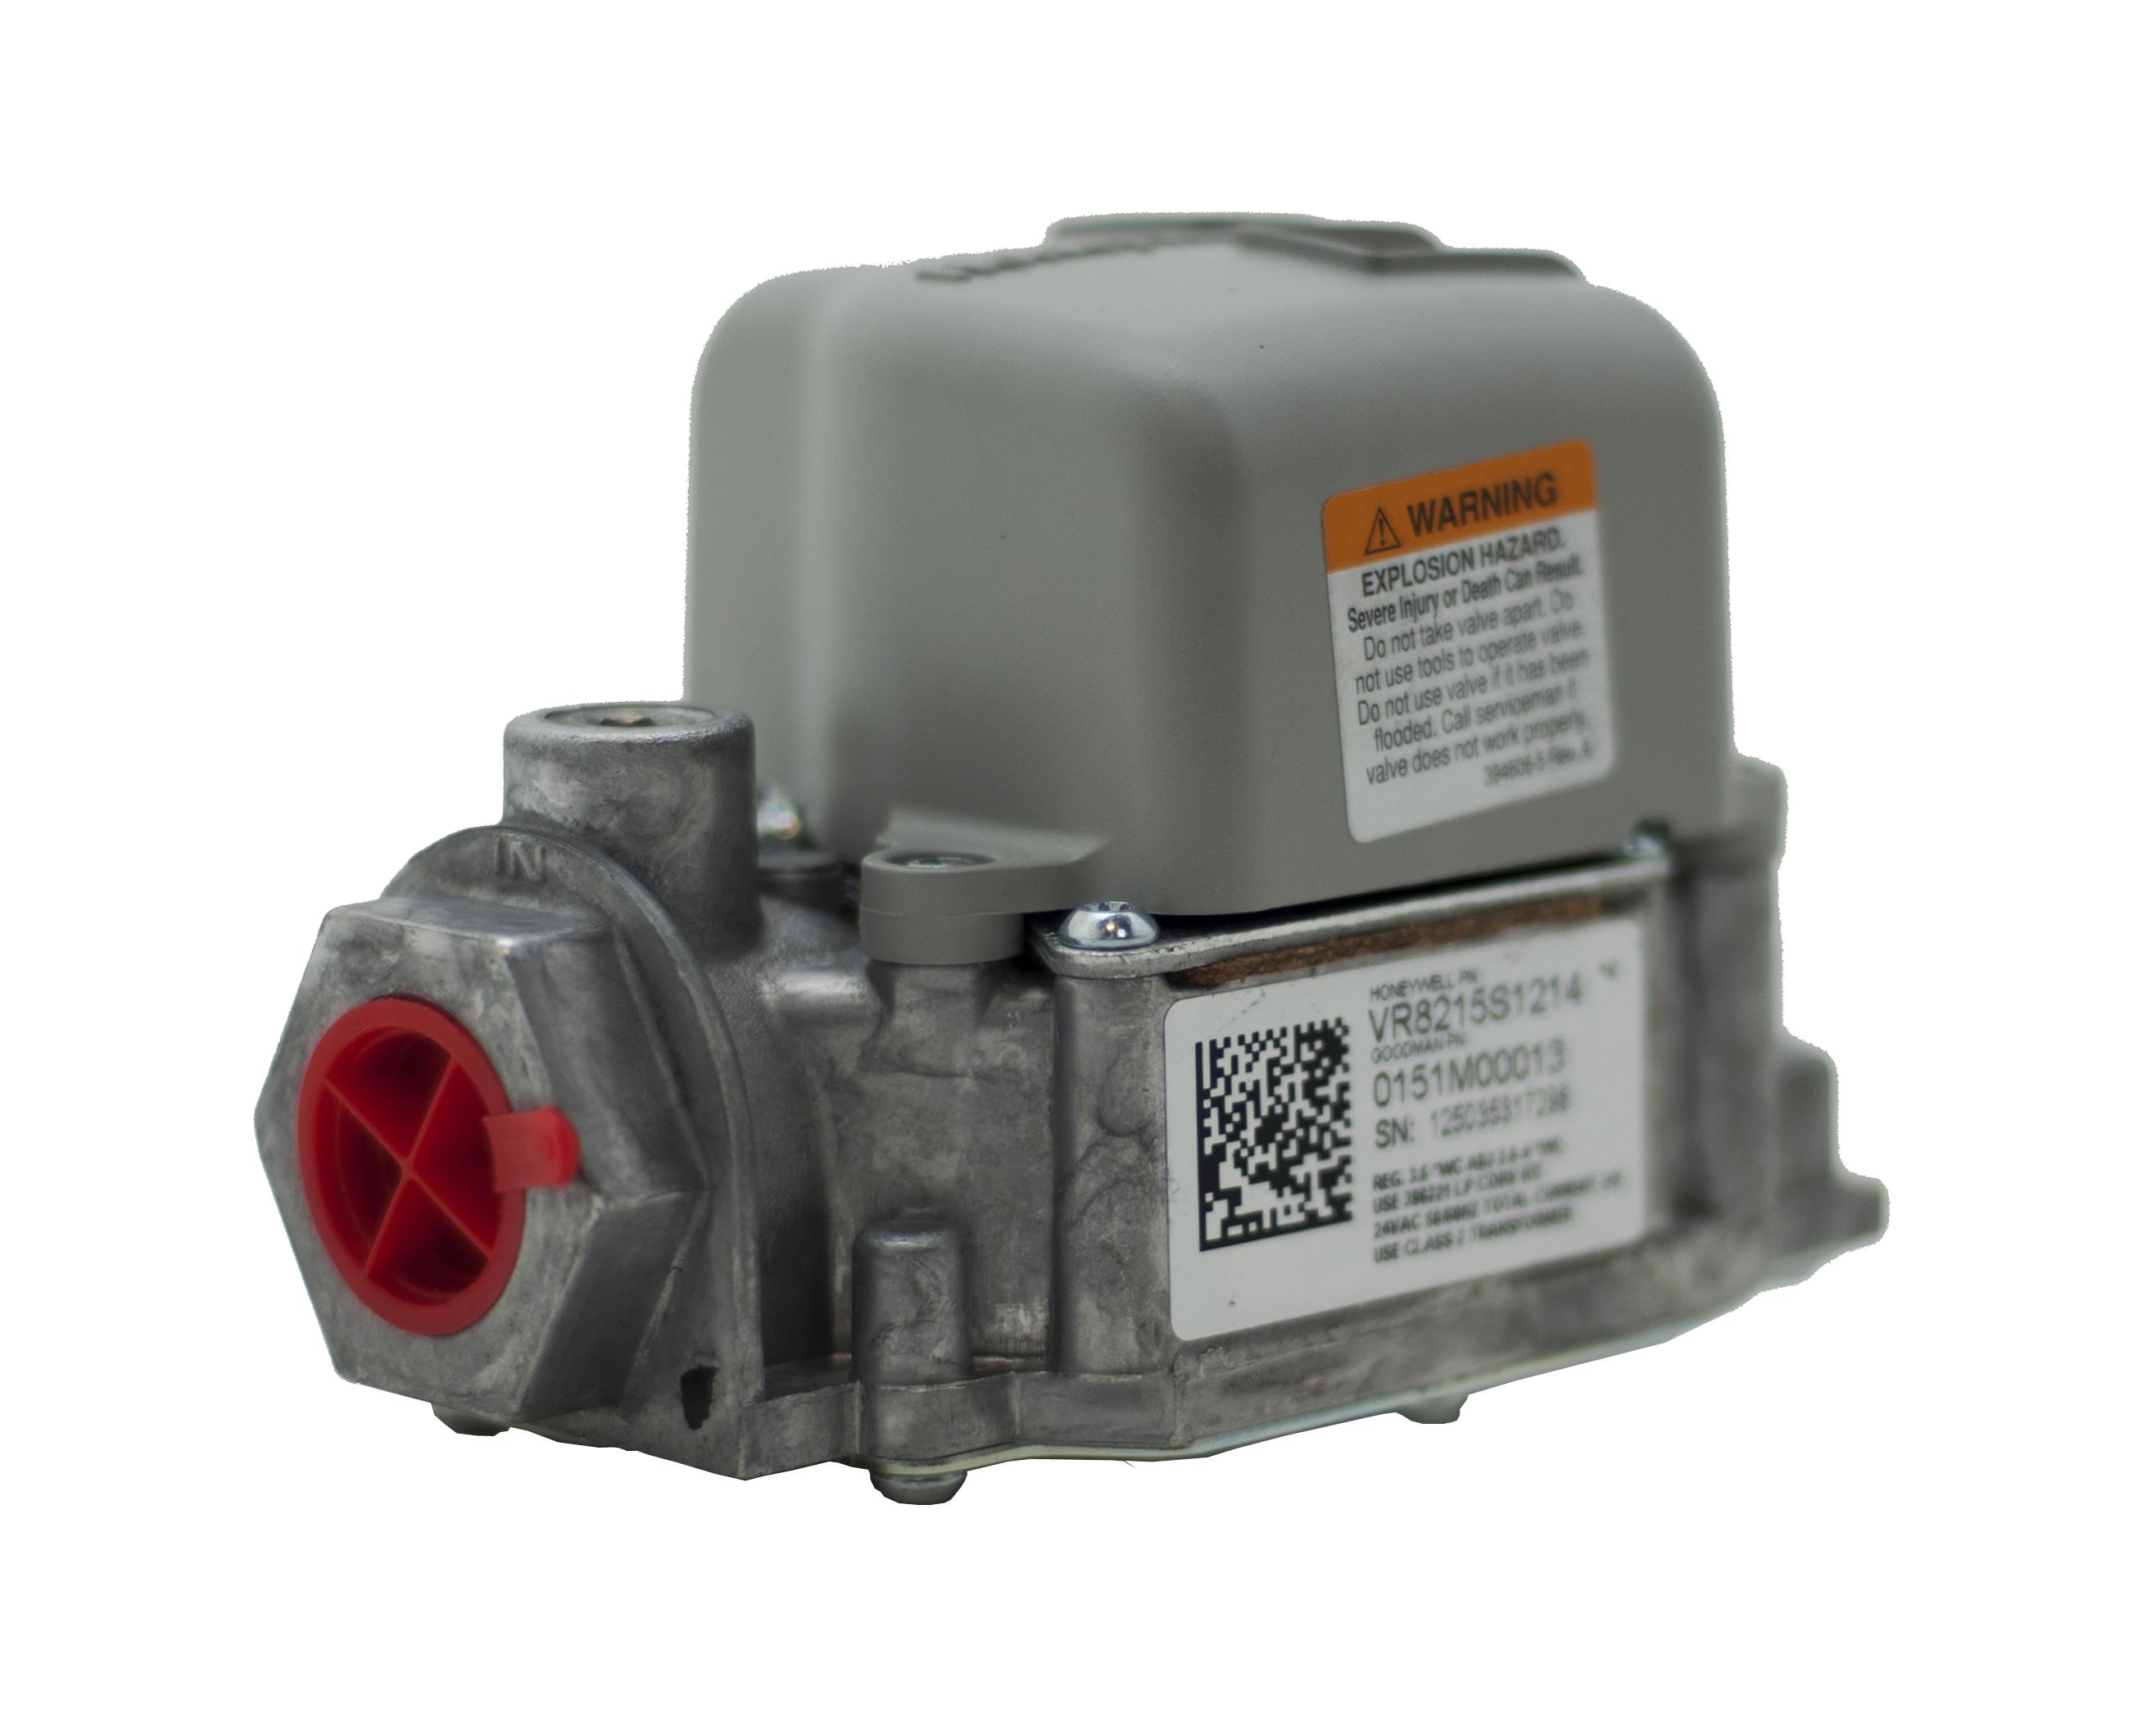 goodman furnace parts diagram led wiring 120v condensing unit